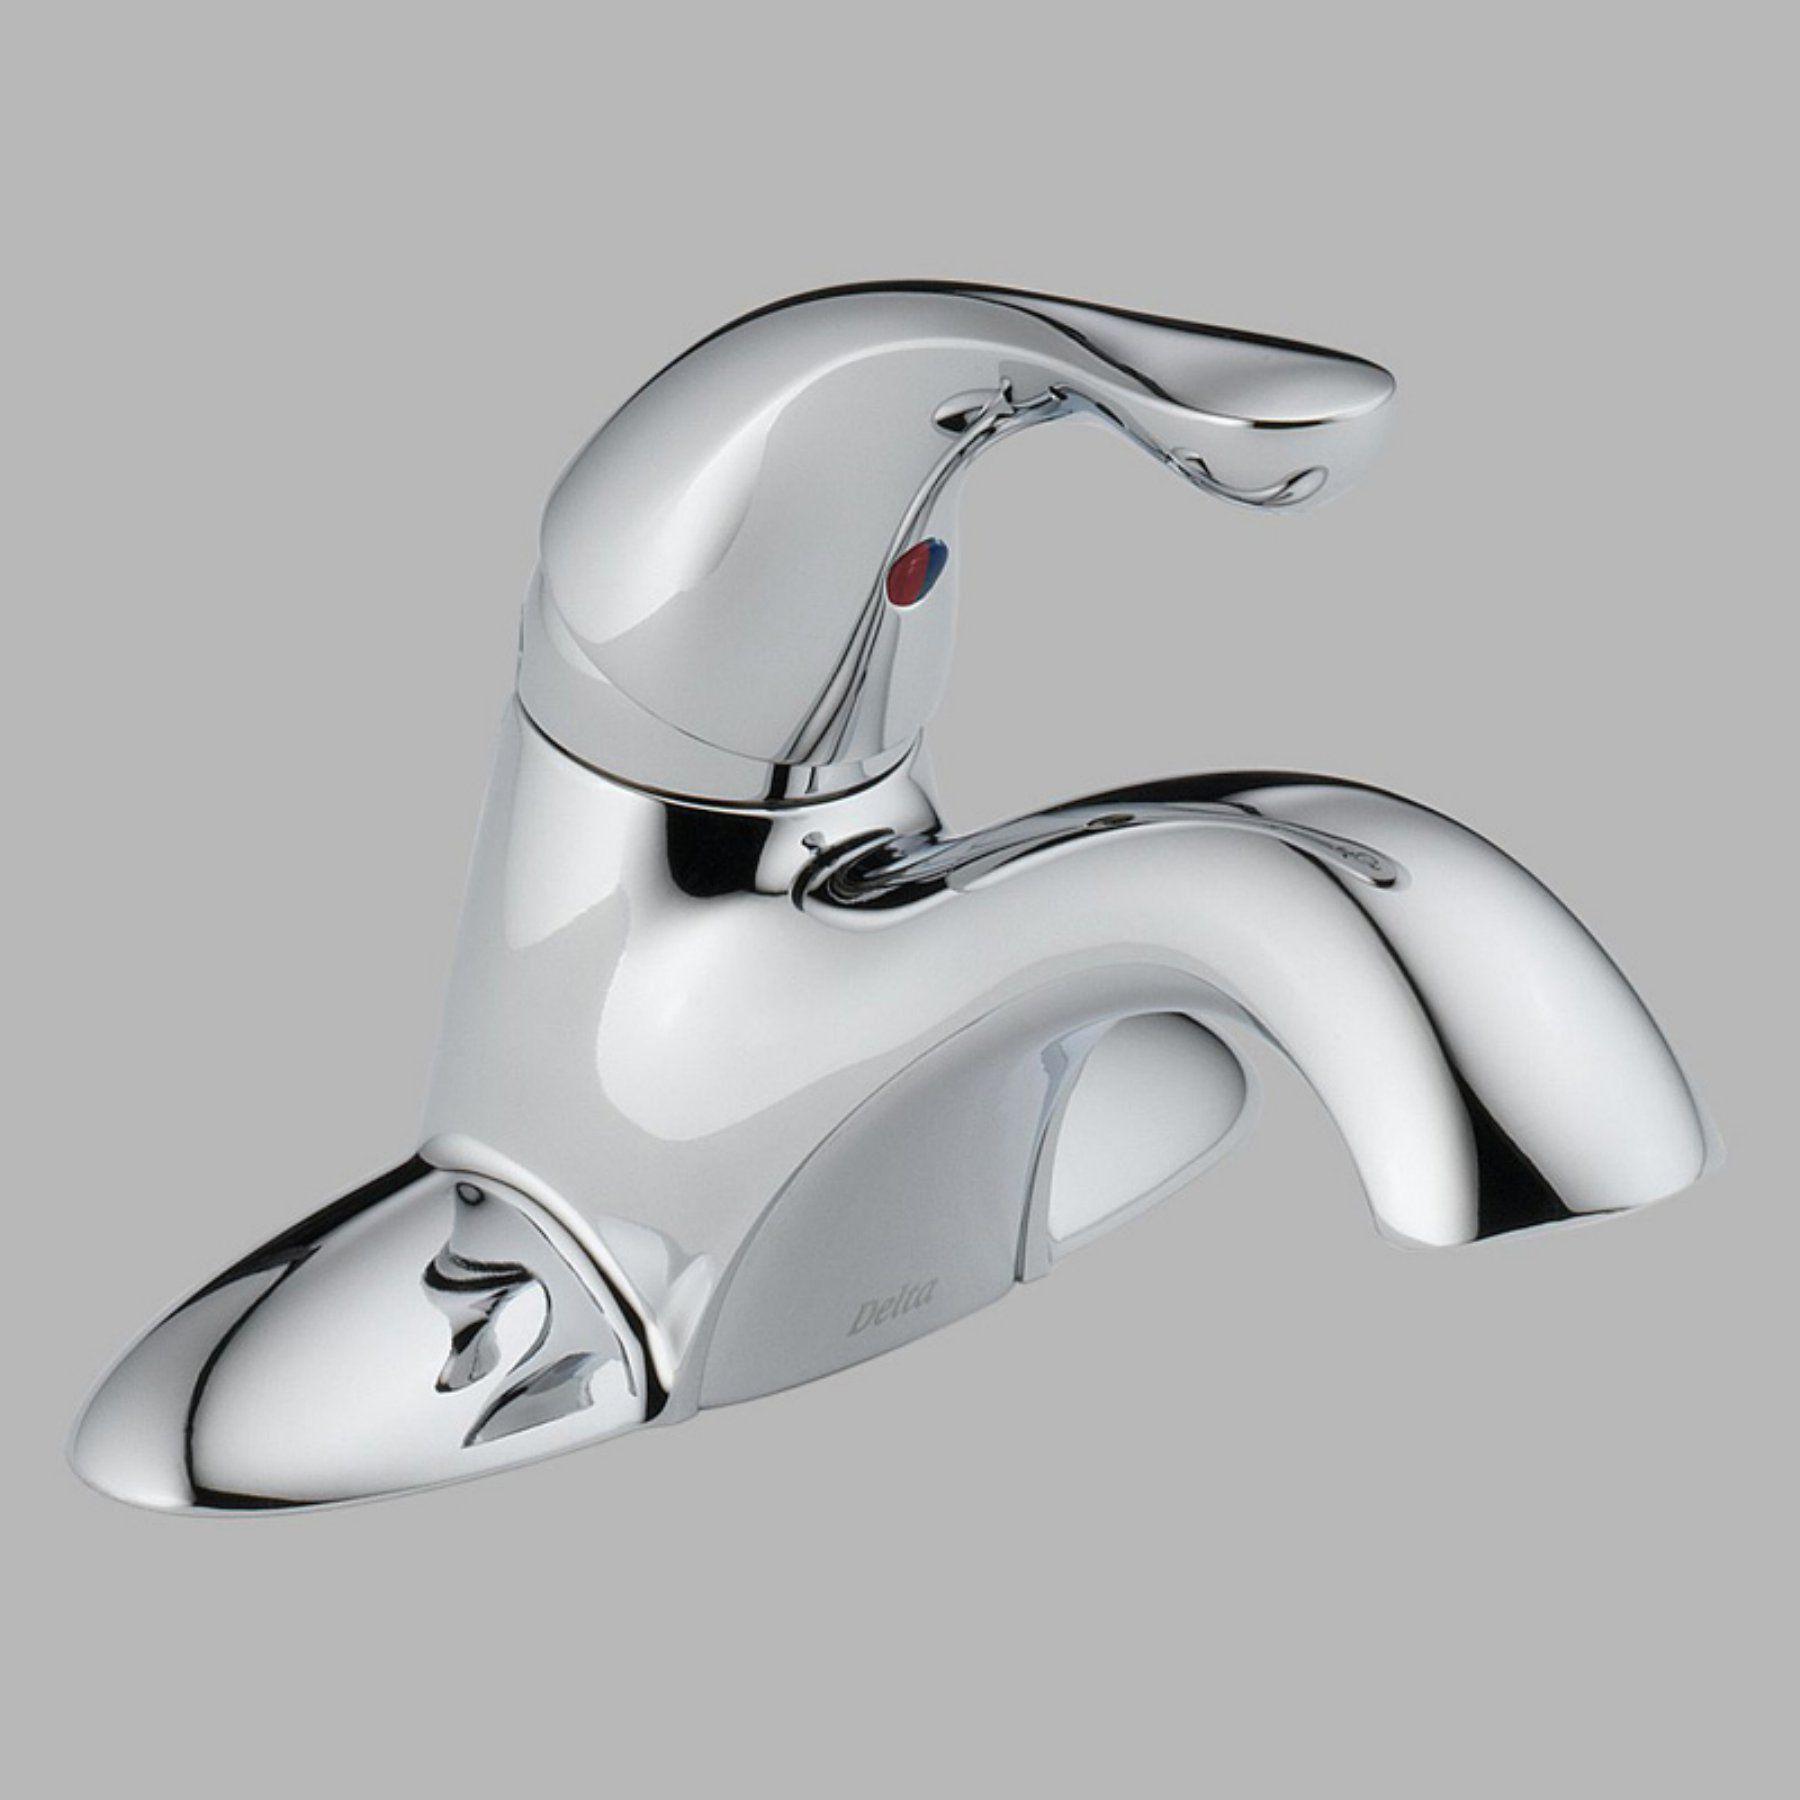 Delta Classic 500-DST Single Handle Centerset Bathroom Sink Faucet ...